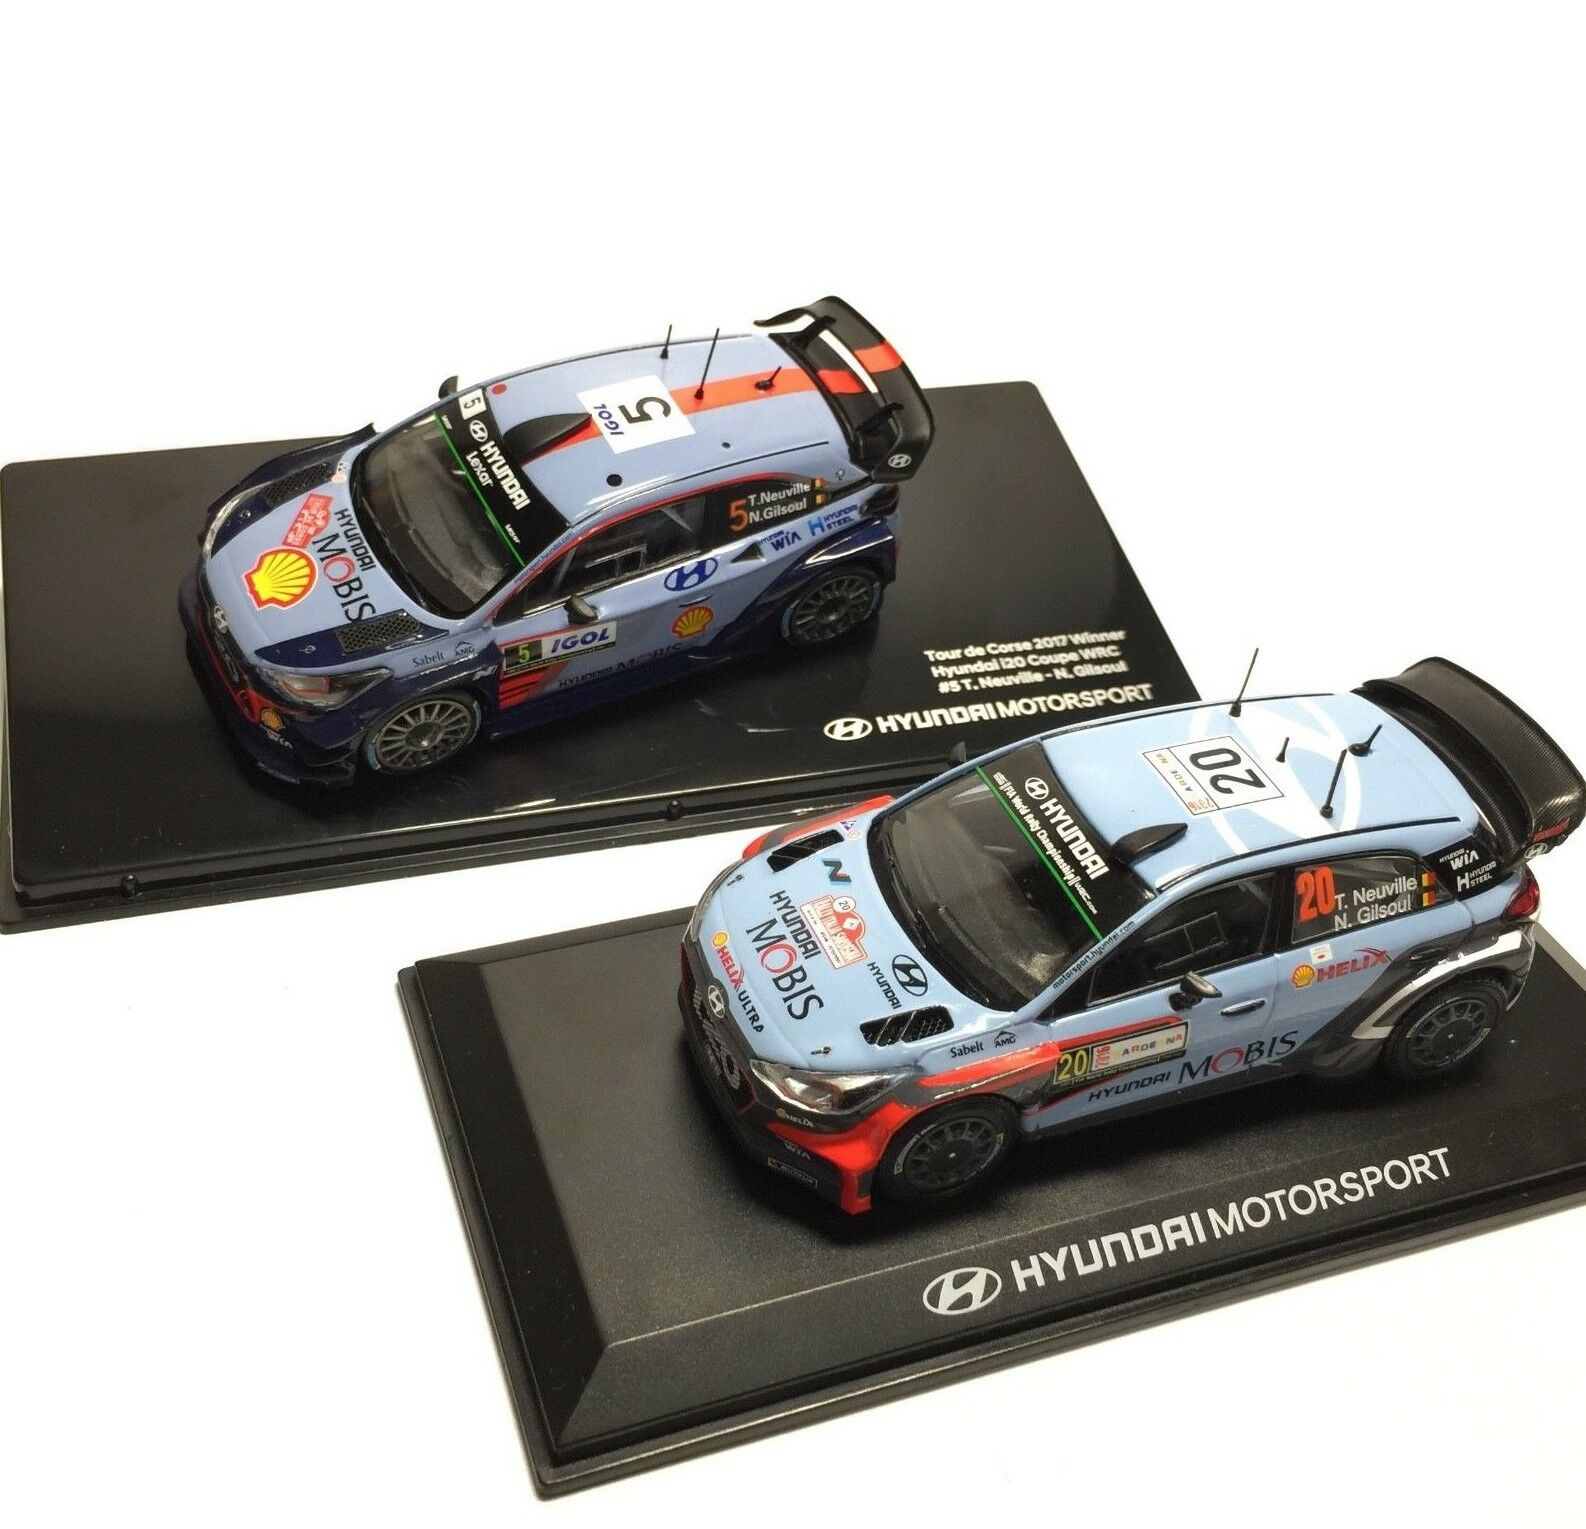 Hyundai i20 Coupe WRC 1 43 Rally Winner 2016 1ea, 2017 1ea - Thierry Neuville